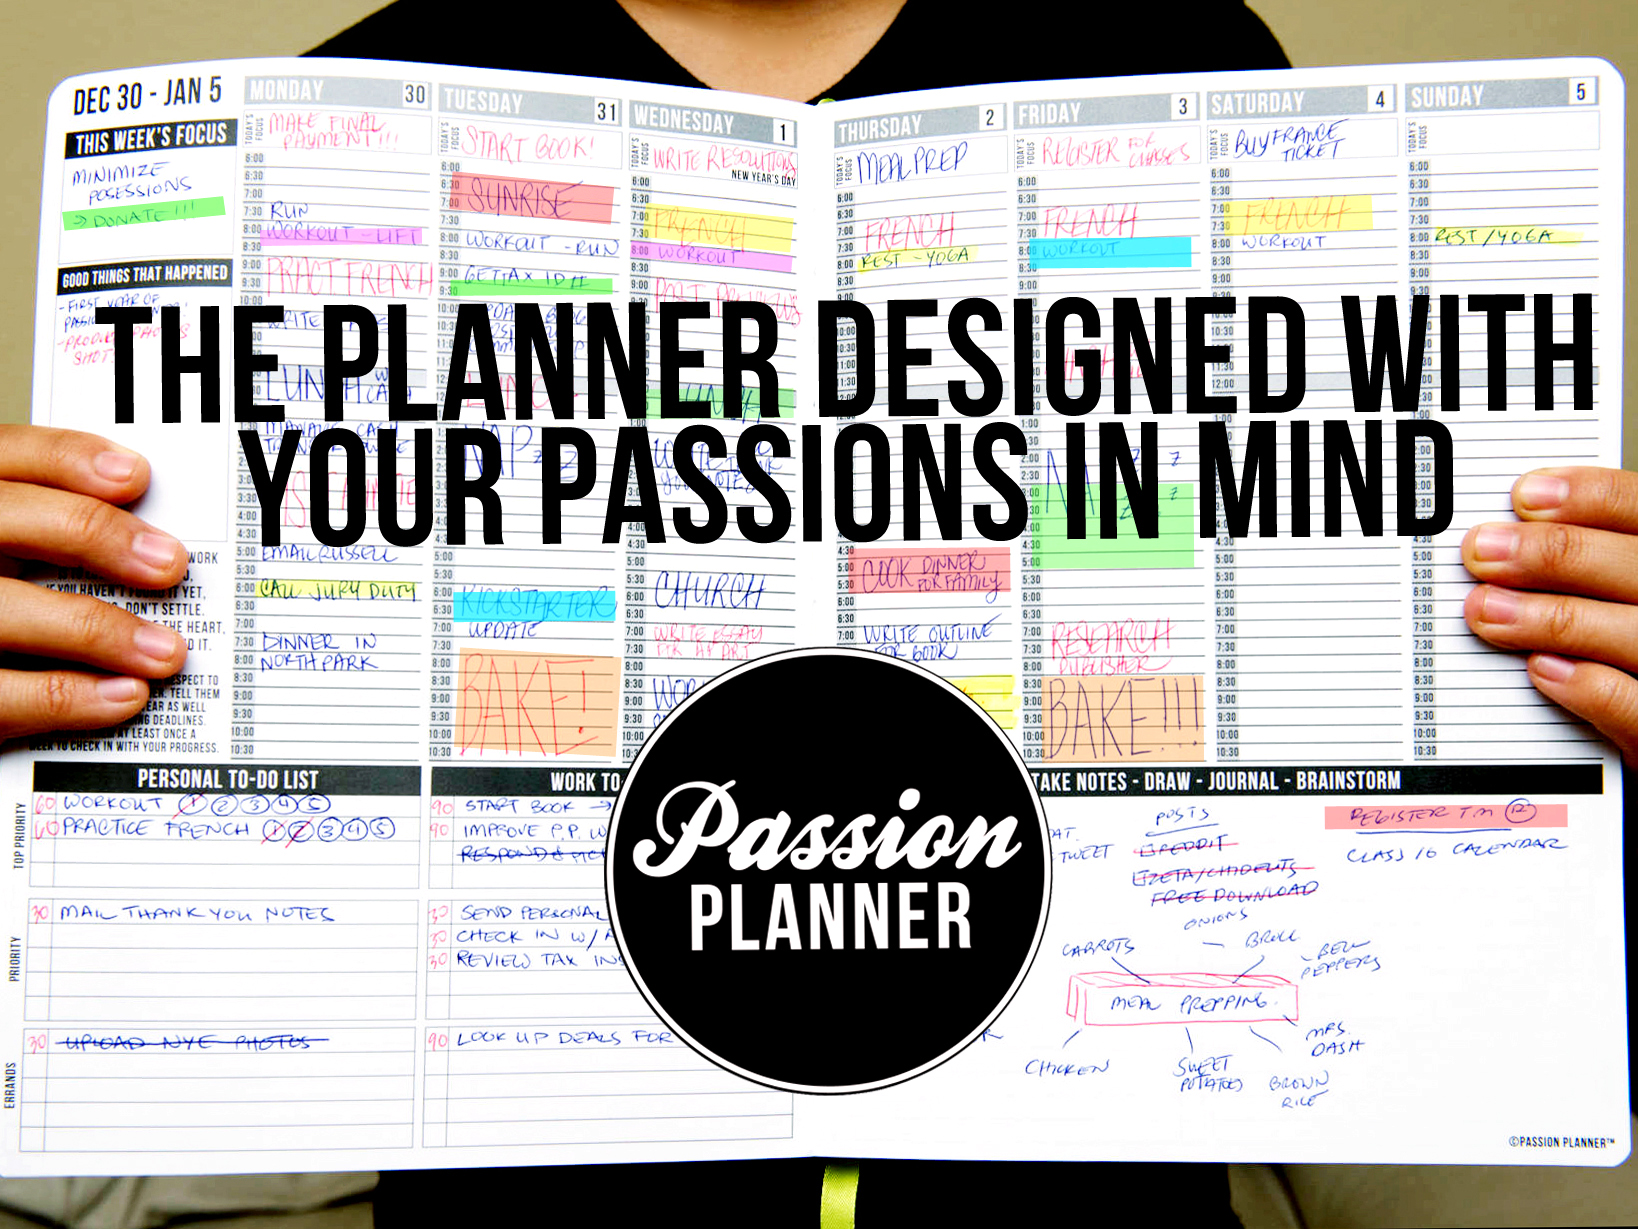 Passion Palnner Slogan.jpg